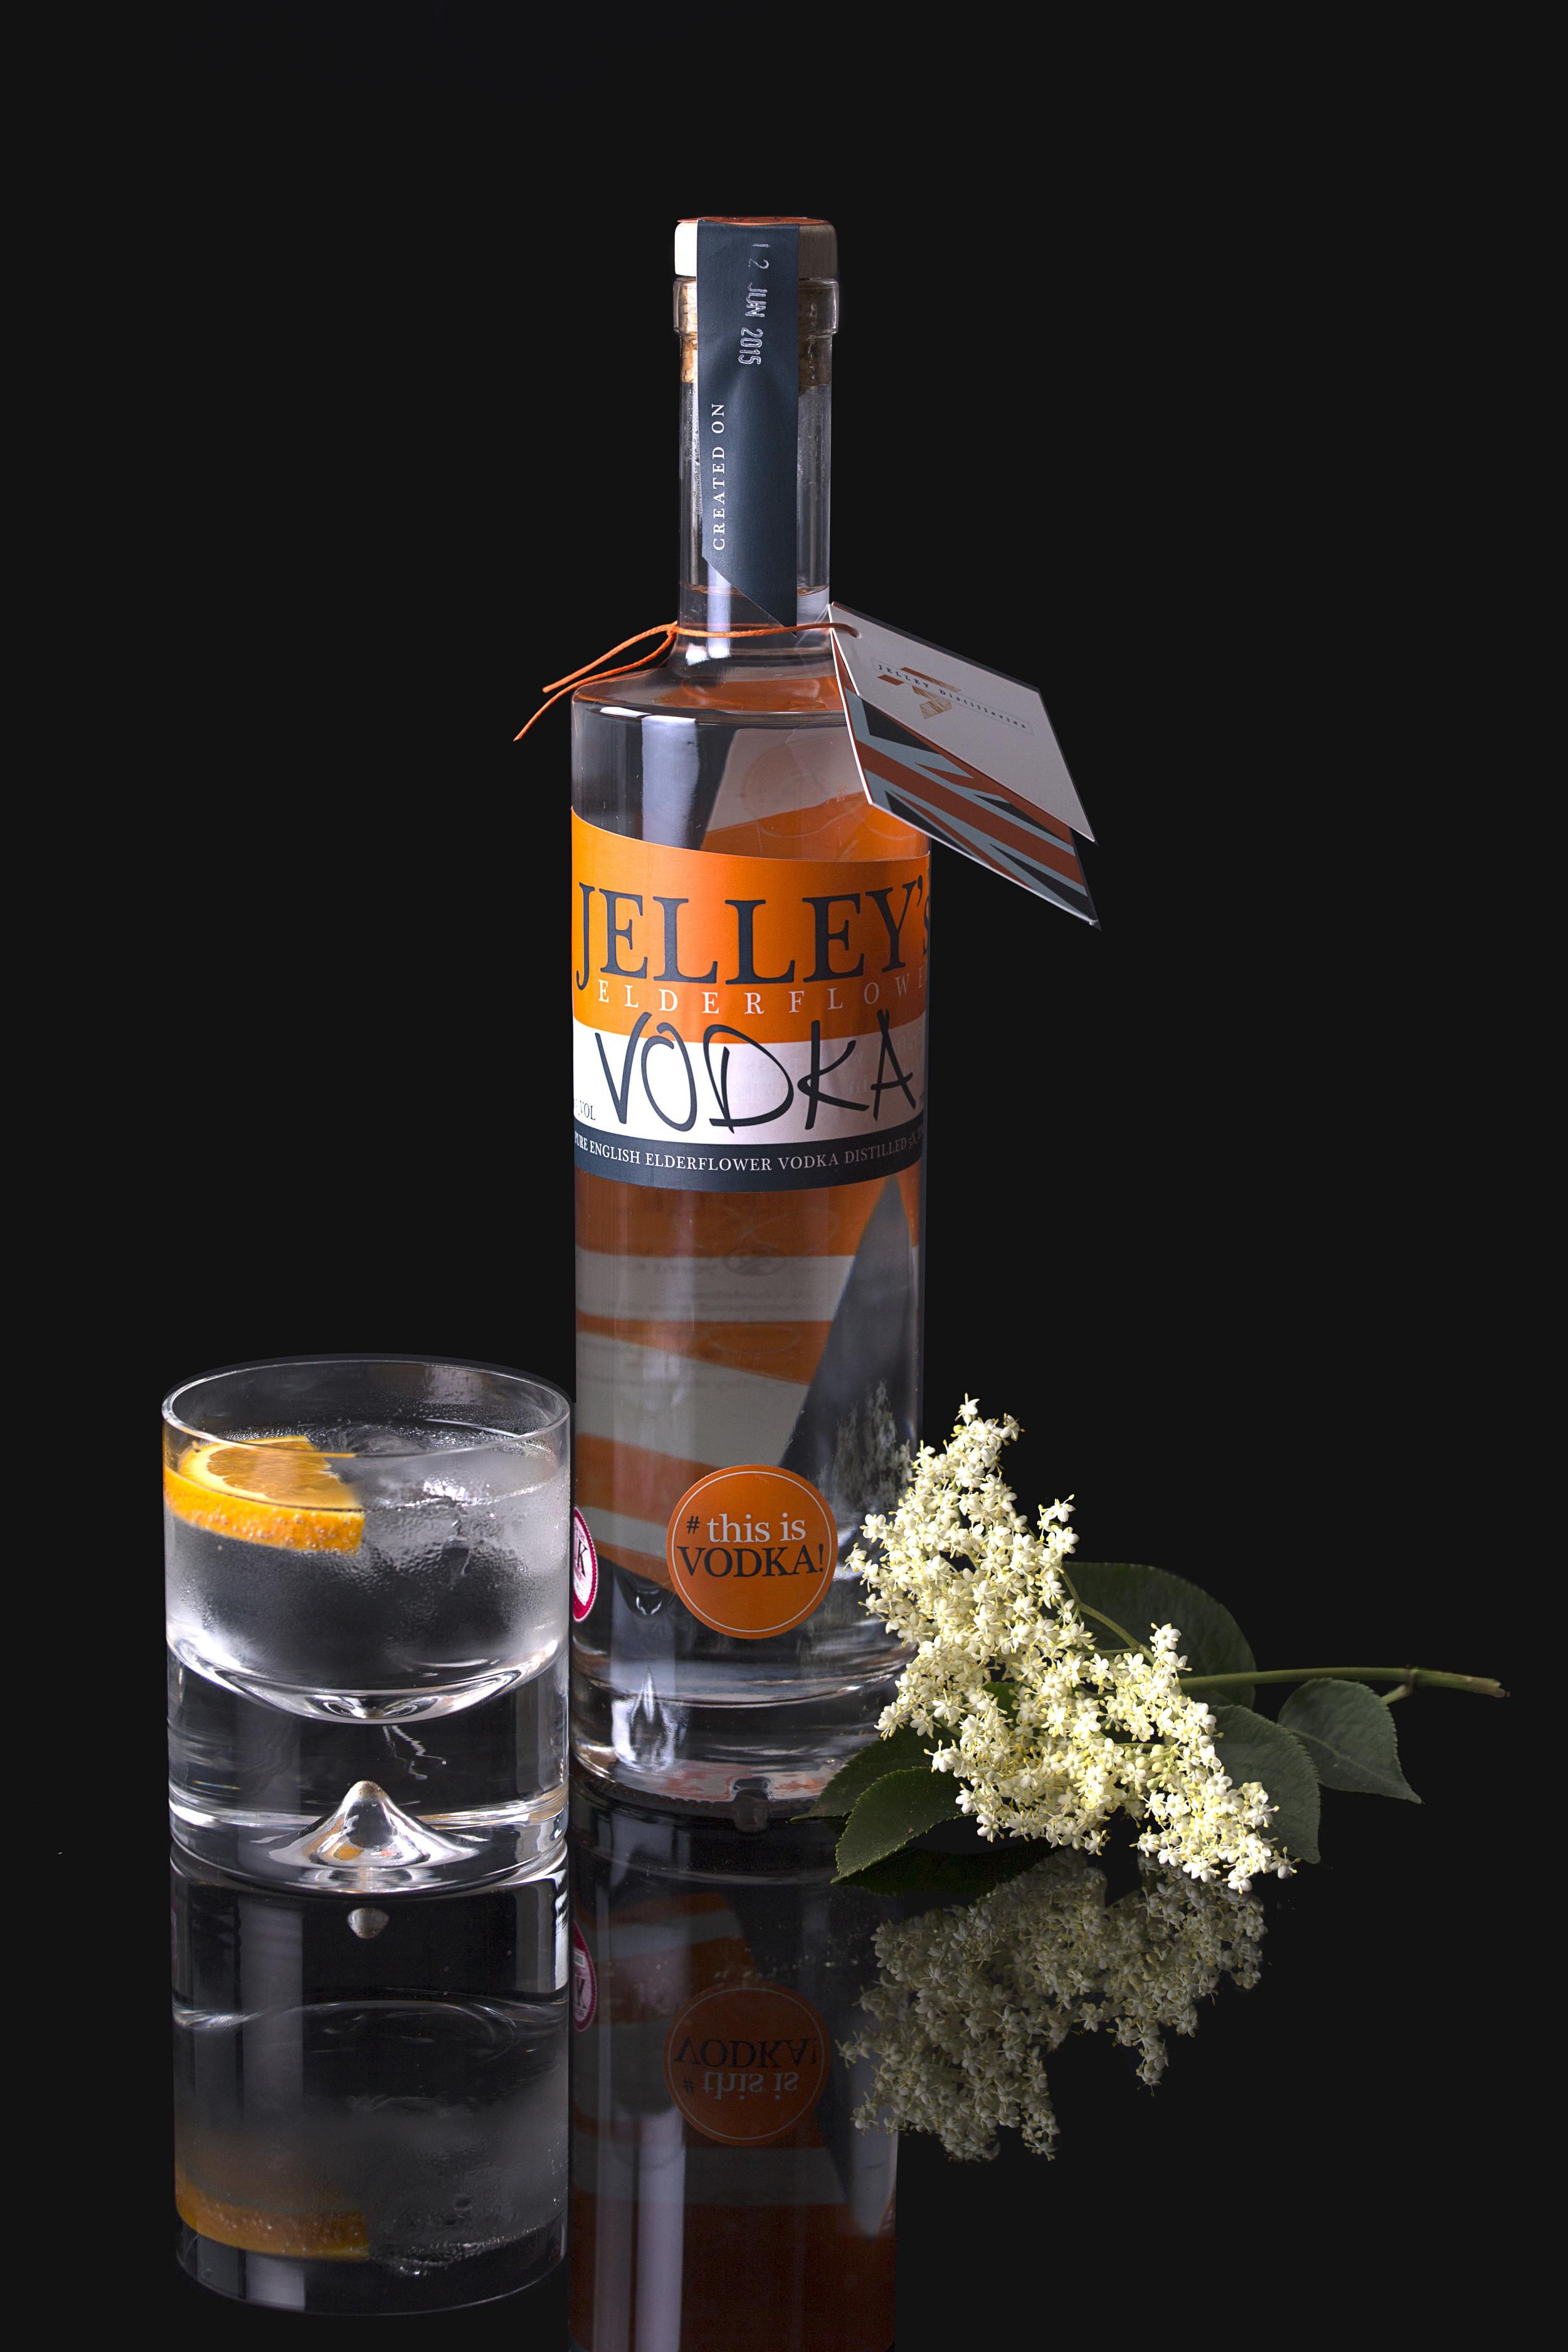 Jelley's Vodka bottle